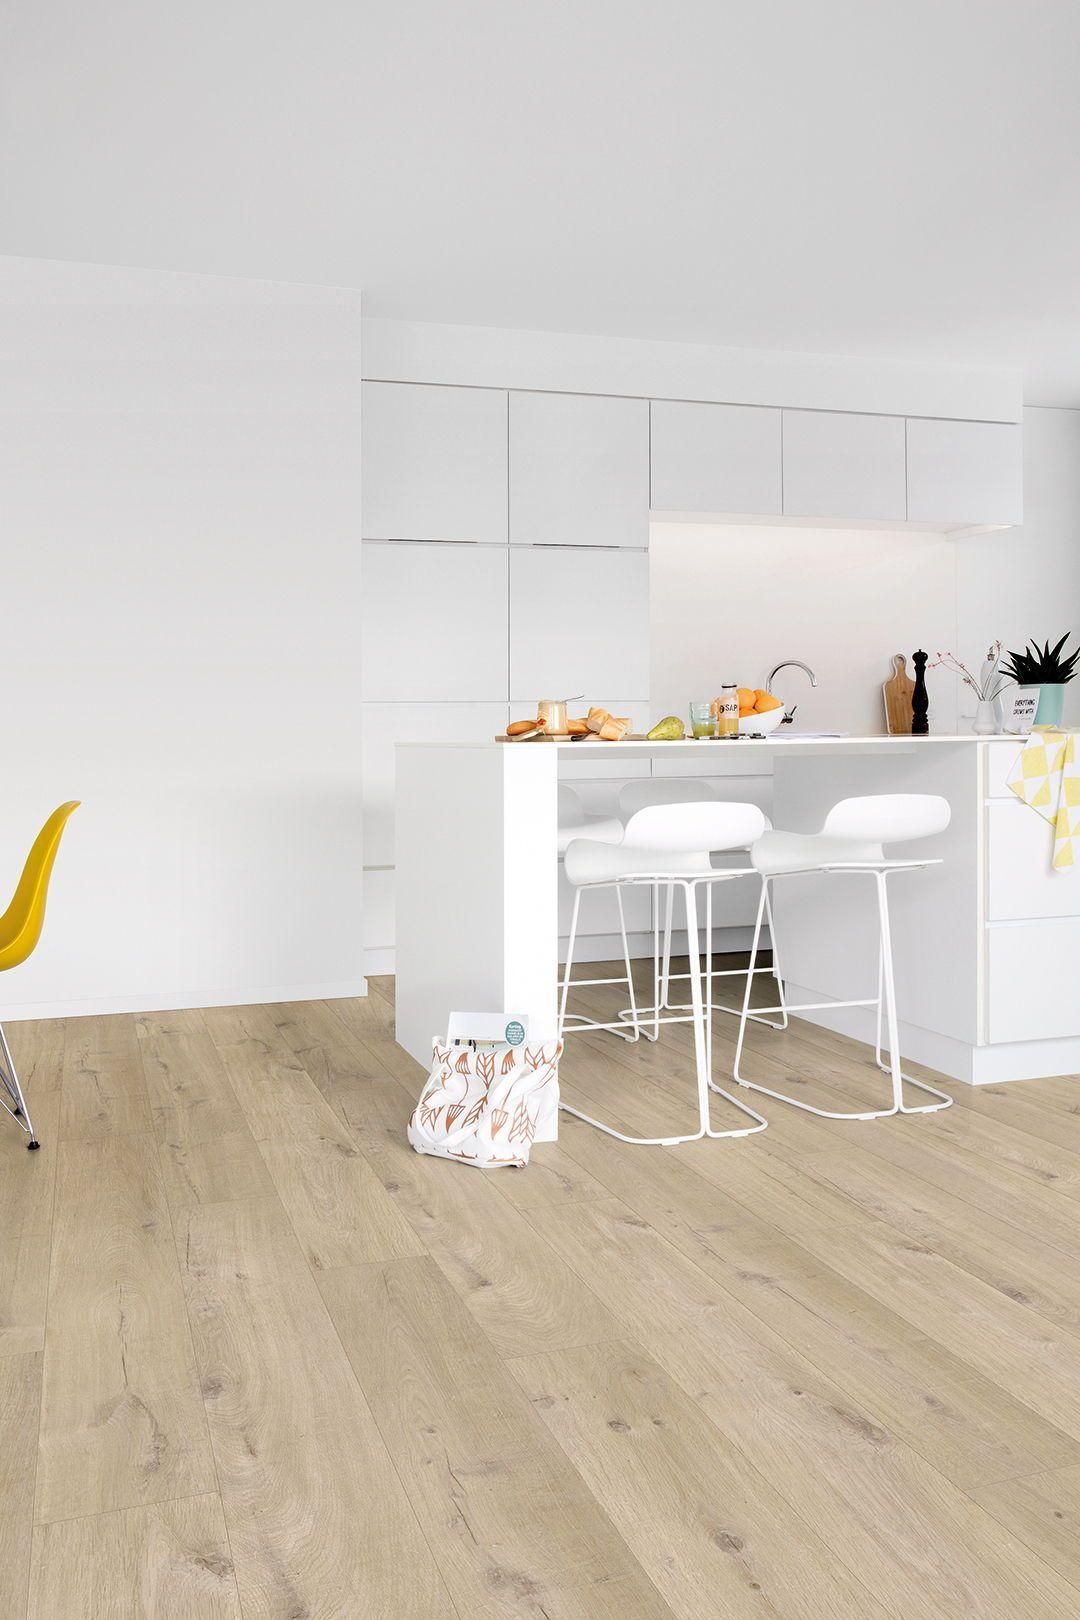 Beautiful Natural Looking Oak Flooring Planks Give This Modern Kitchen A Warm Feel The Vinyl Flooring Enr Kitchen Flooring Vinyl Flooring Natural Oak Flooring